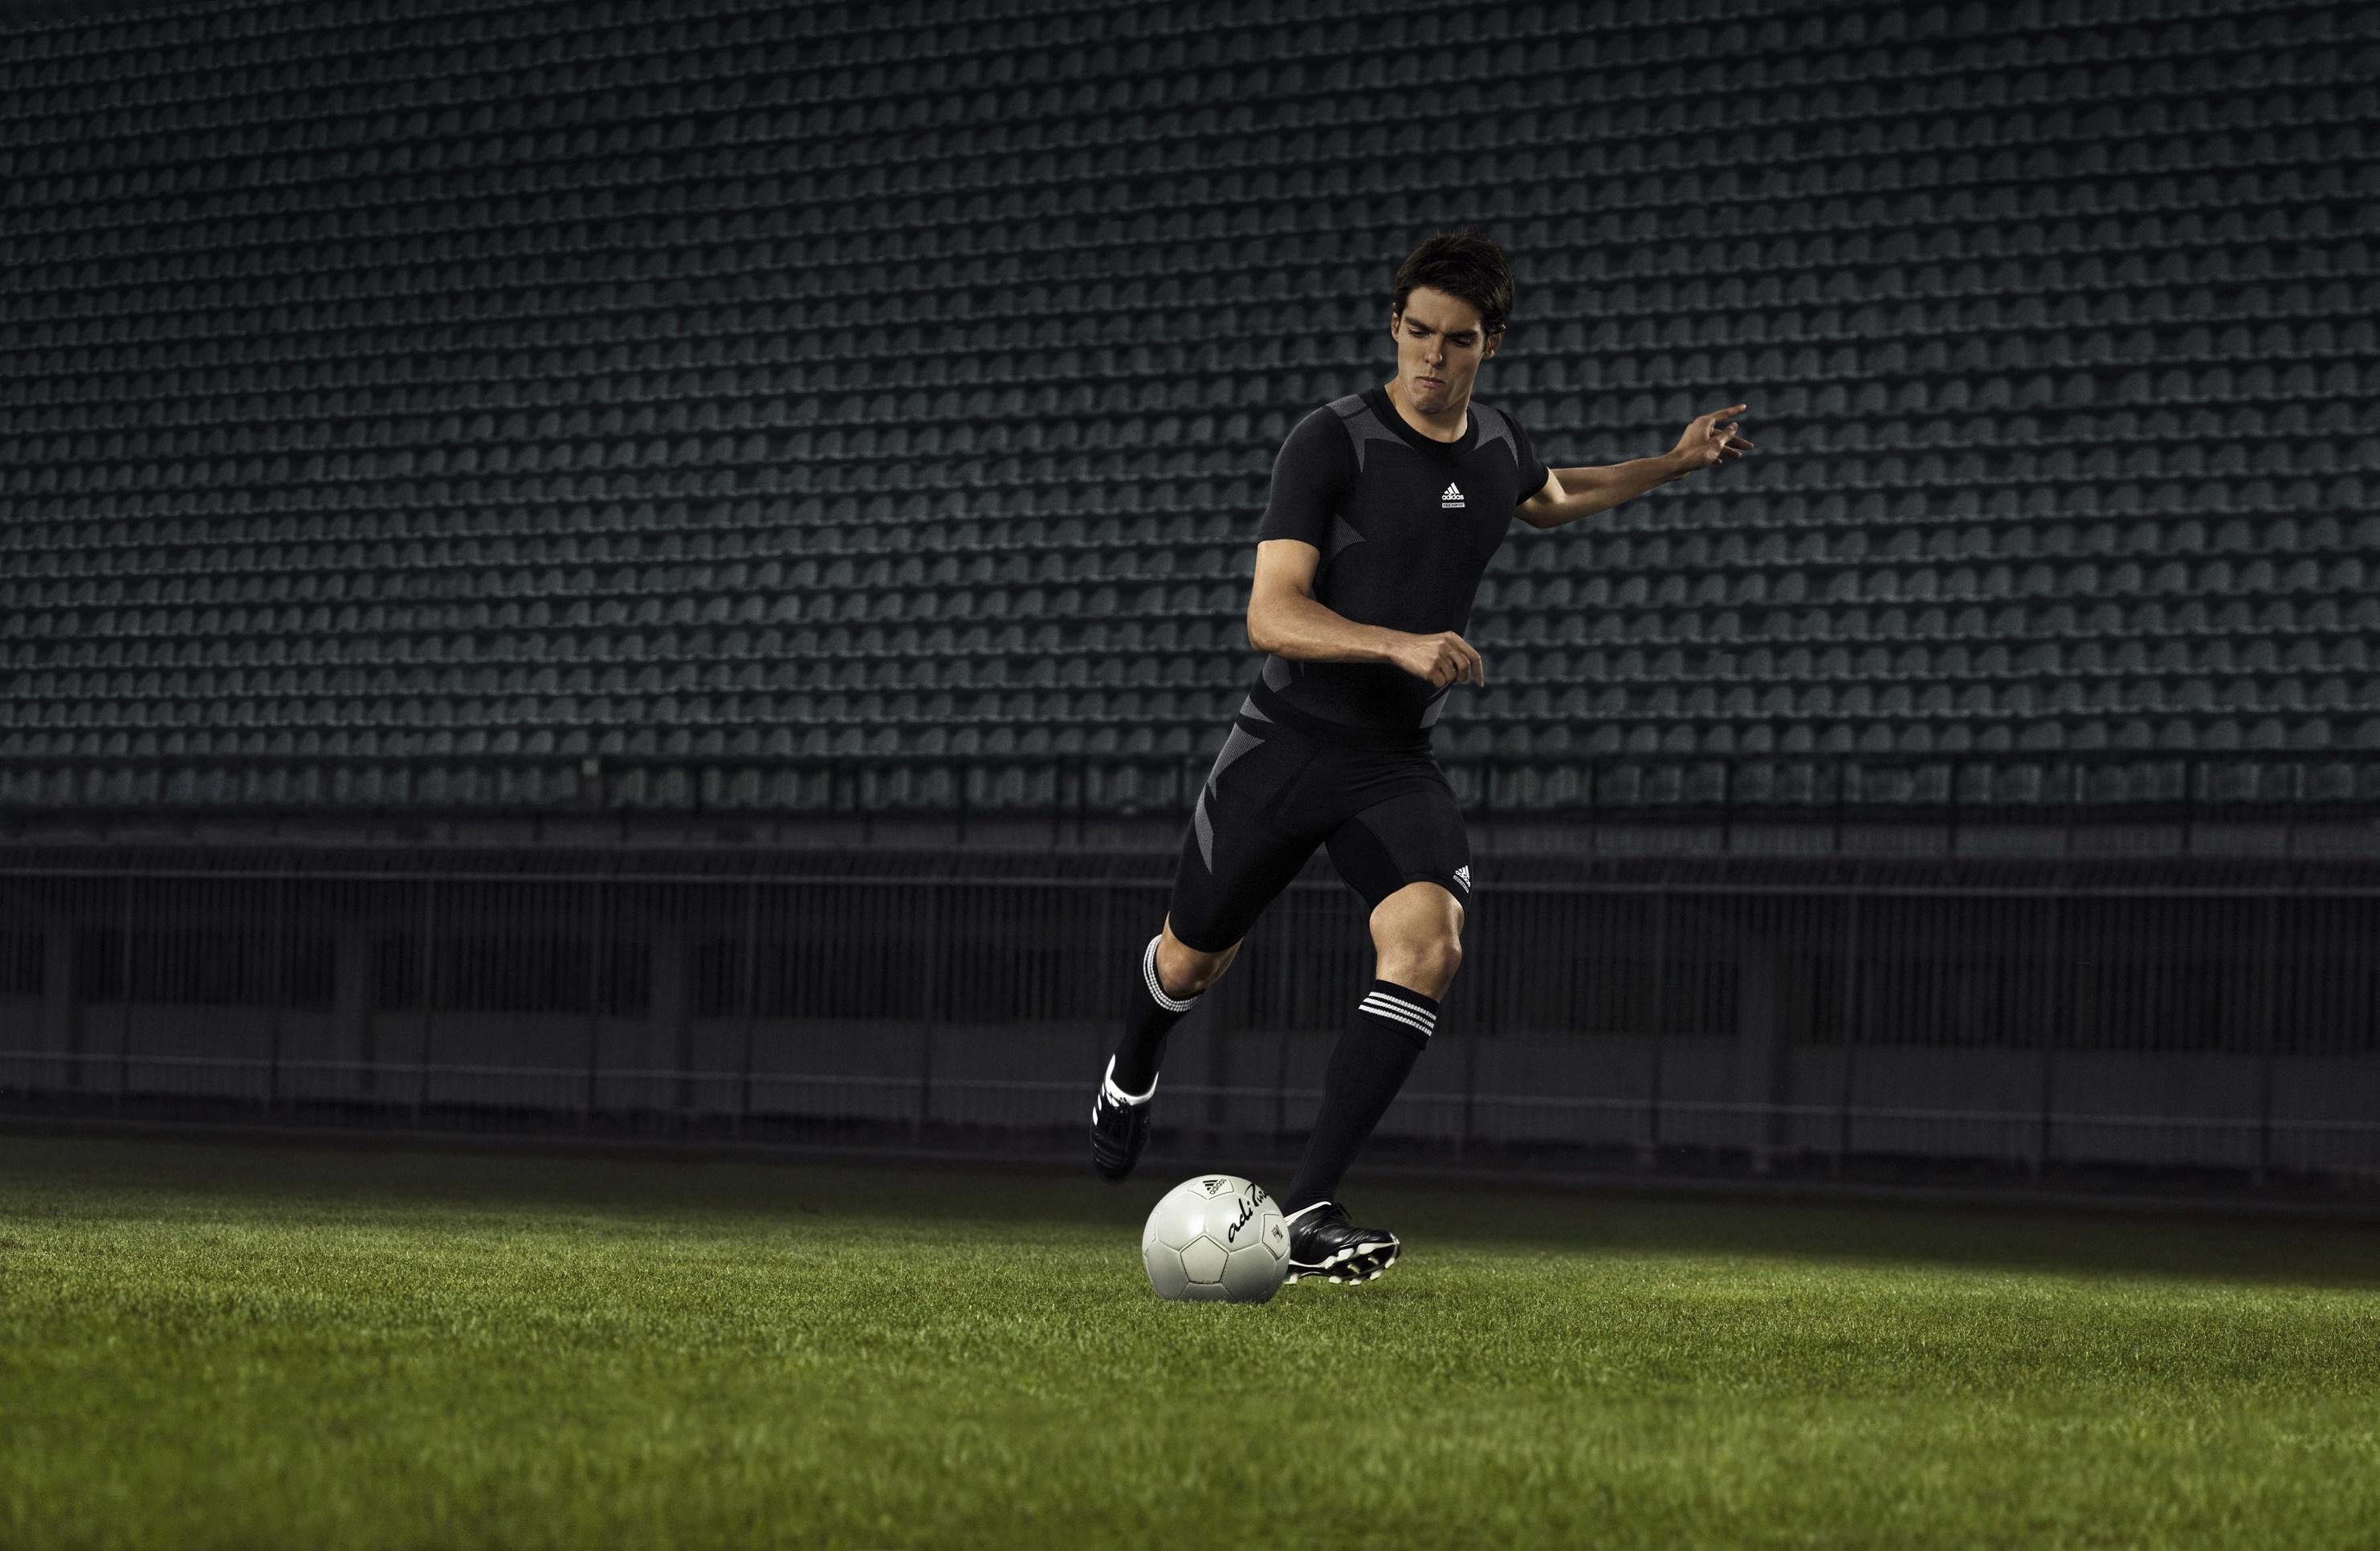 Ricardo Kak   Adidas HD Wallpaper Background Image 2964x1932 2964x1932